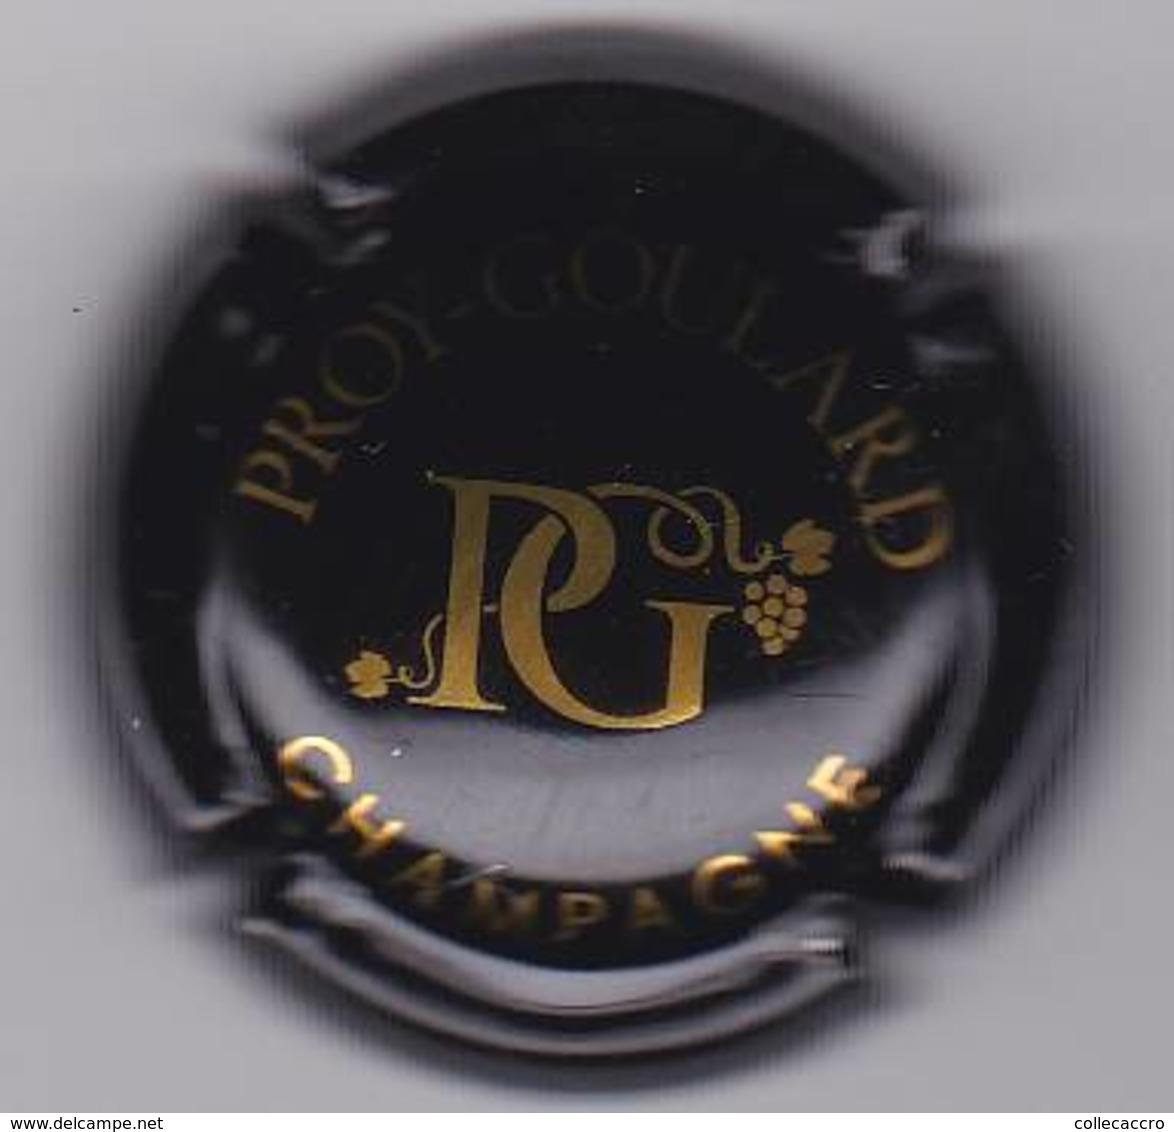 PROY-GOULARD NOUVELLE - Champagne